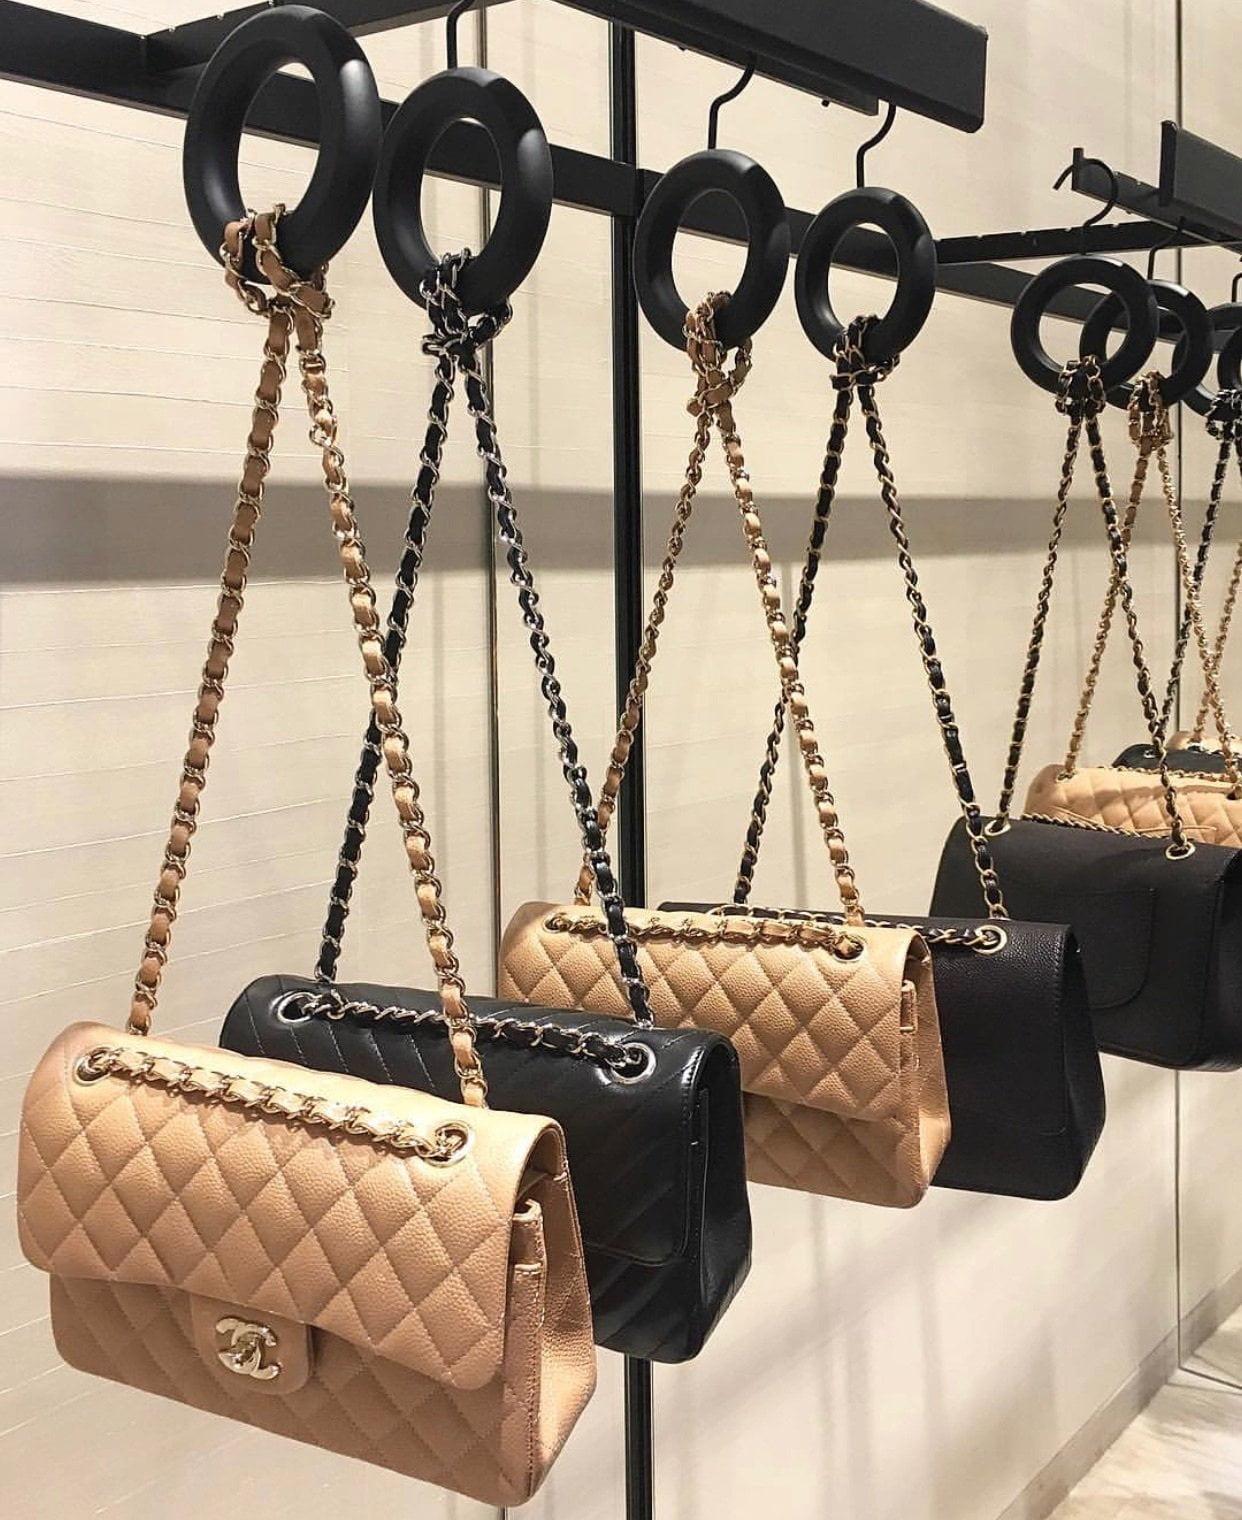 ff54fea7fb7d Chanel Pulls Back Its Financial Robe - PurseBop